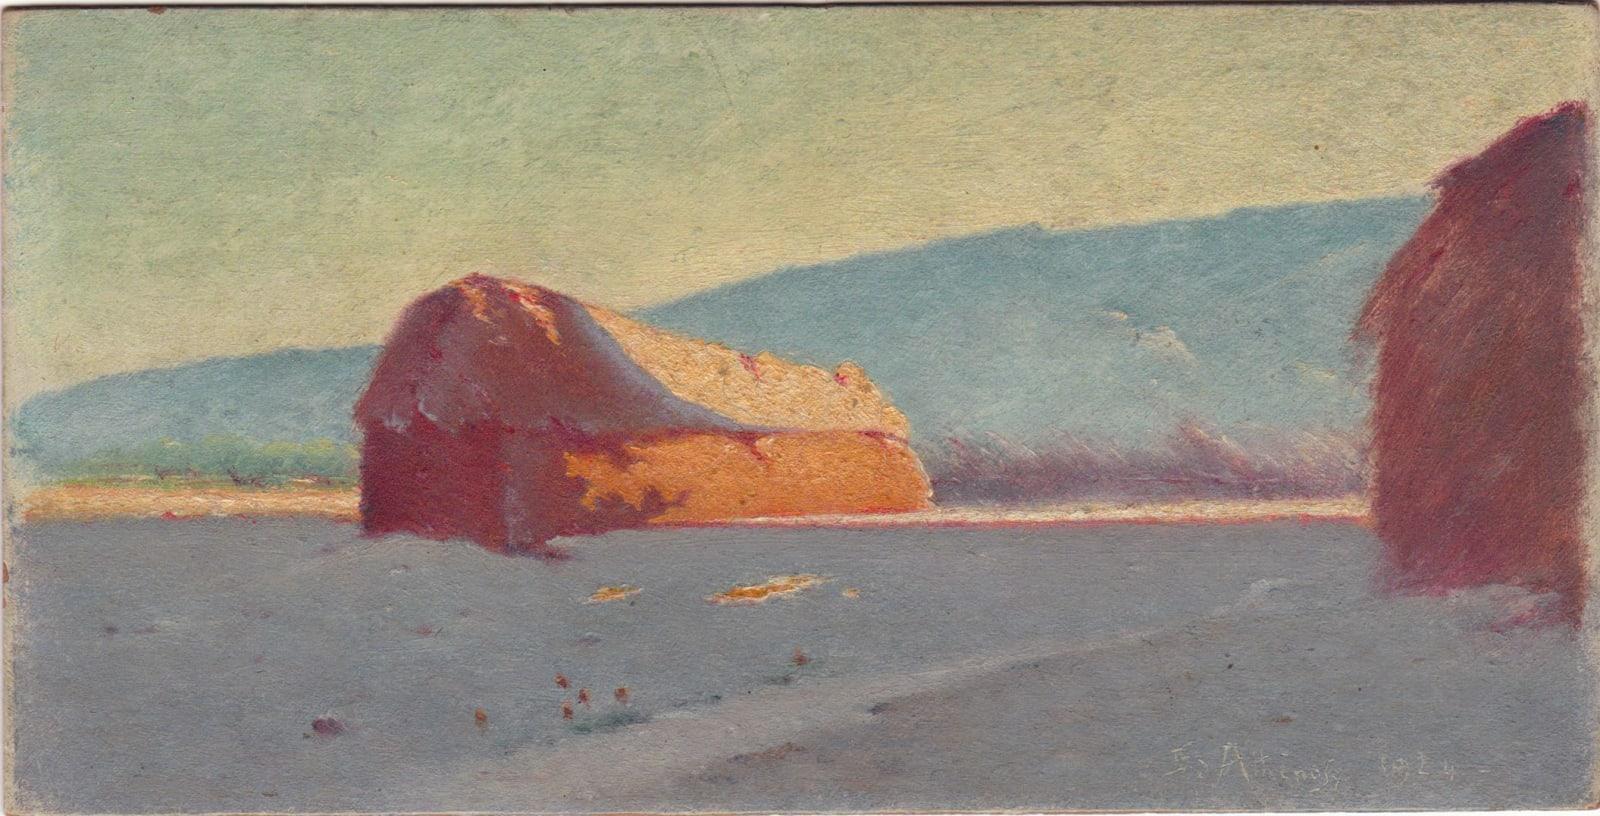 EDOUARD ATHÉNOSY, P-49, 1924